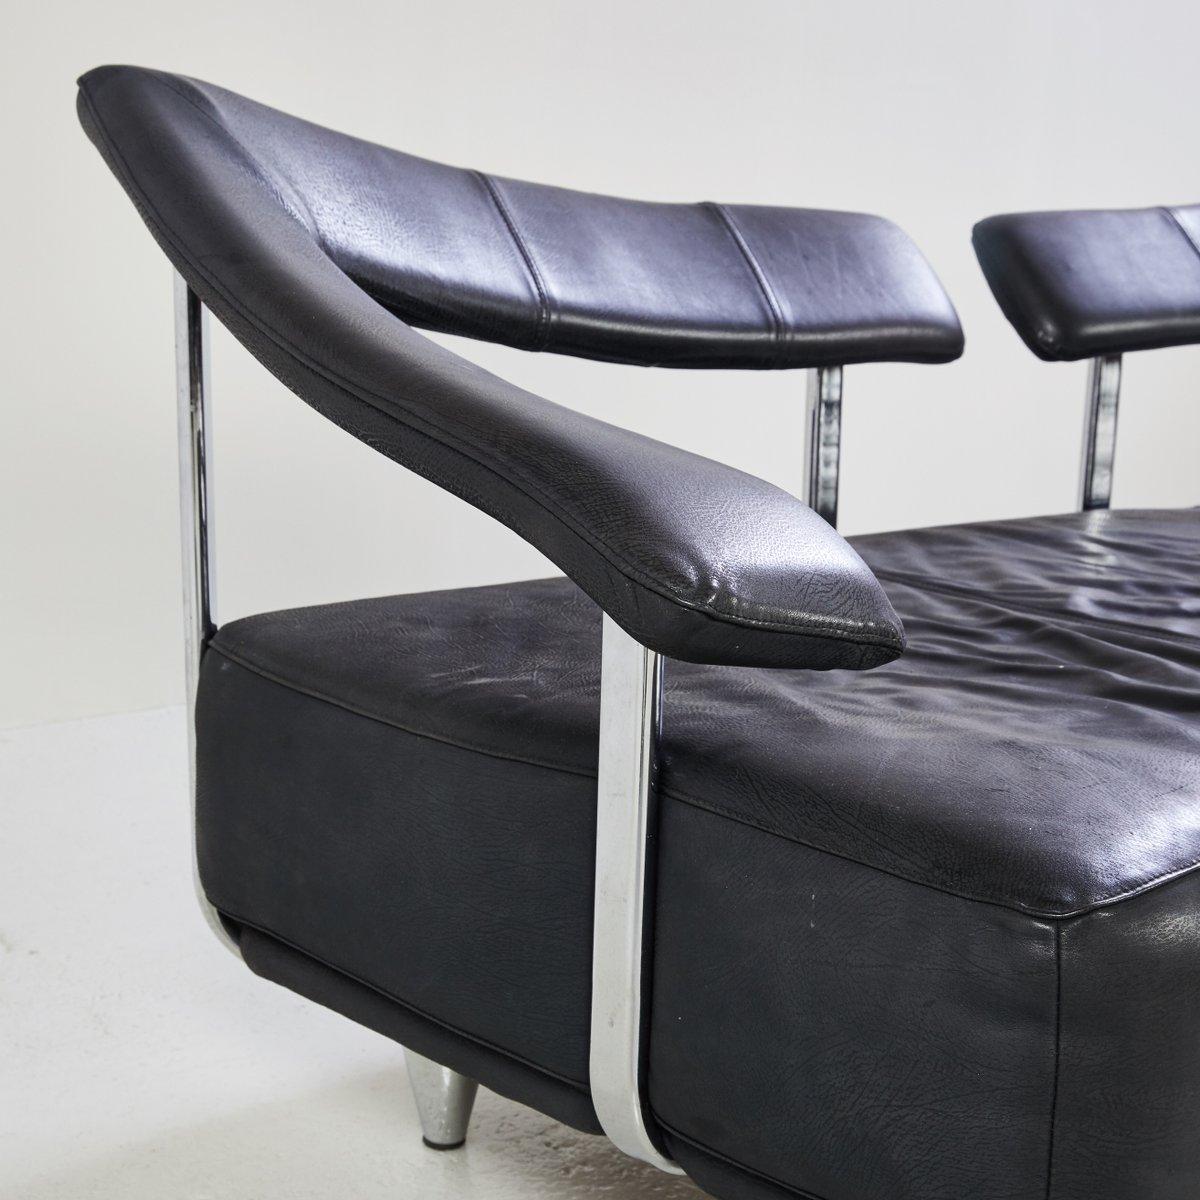 schwarzes 3 sitzer ledersofa 1980er bei pamono kaufen. Black Bedroom Furniture Sets. Home Design Ideas